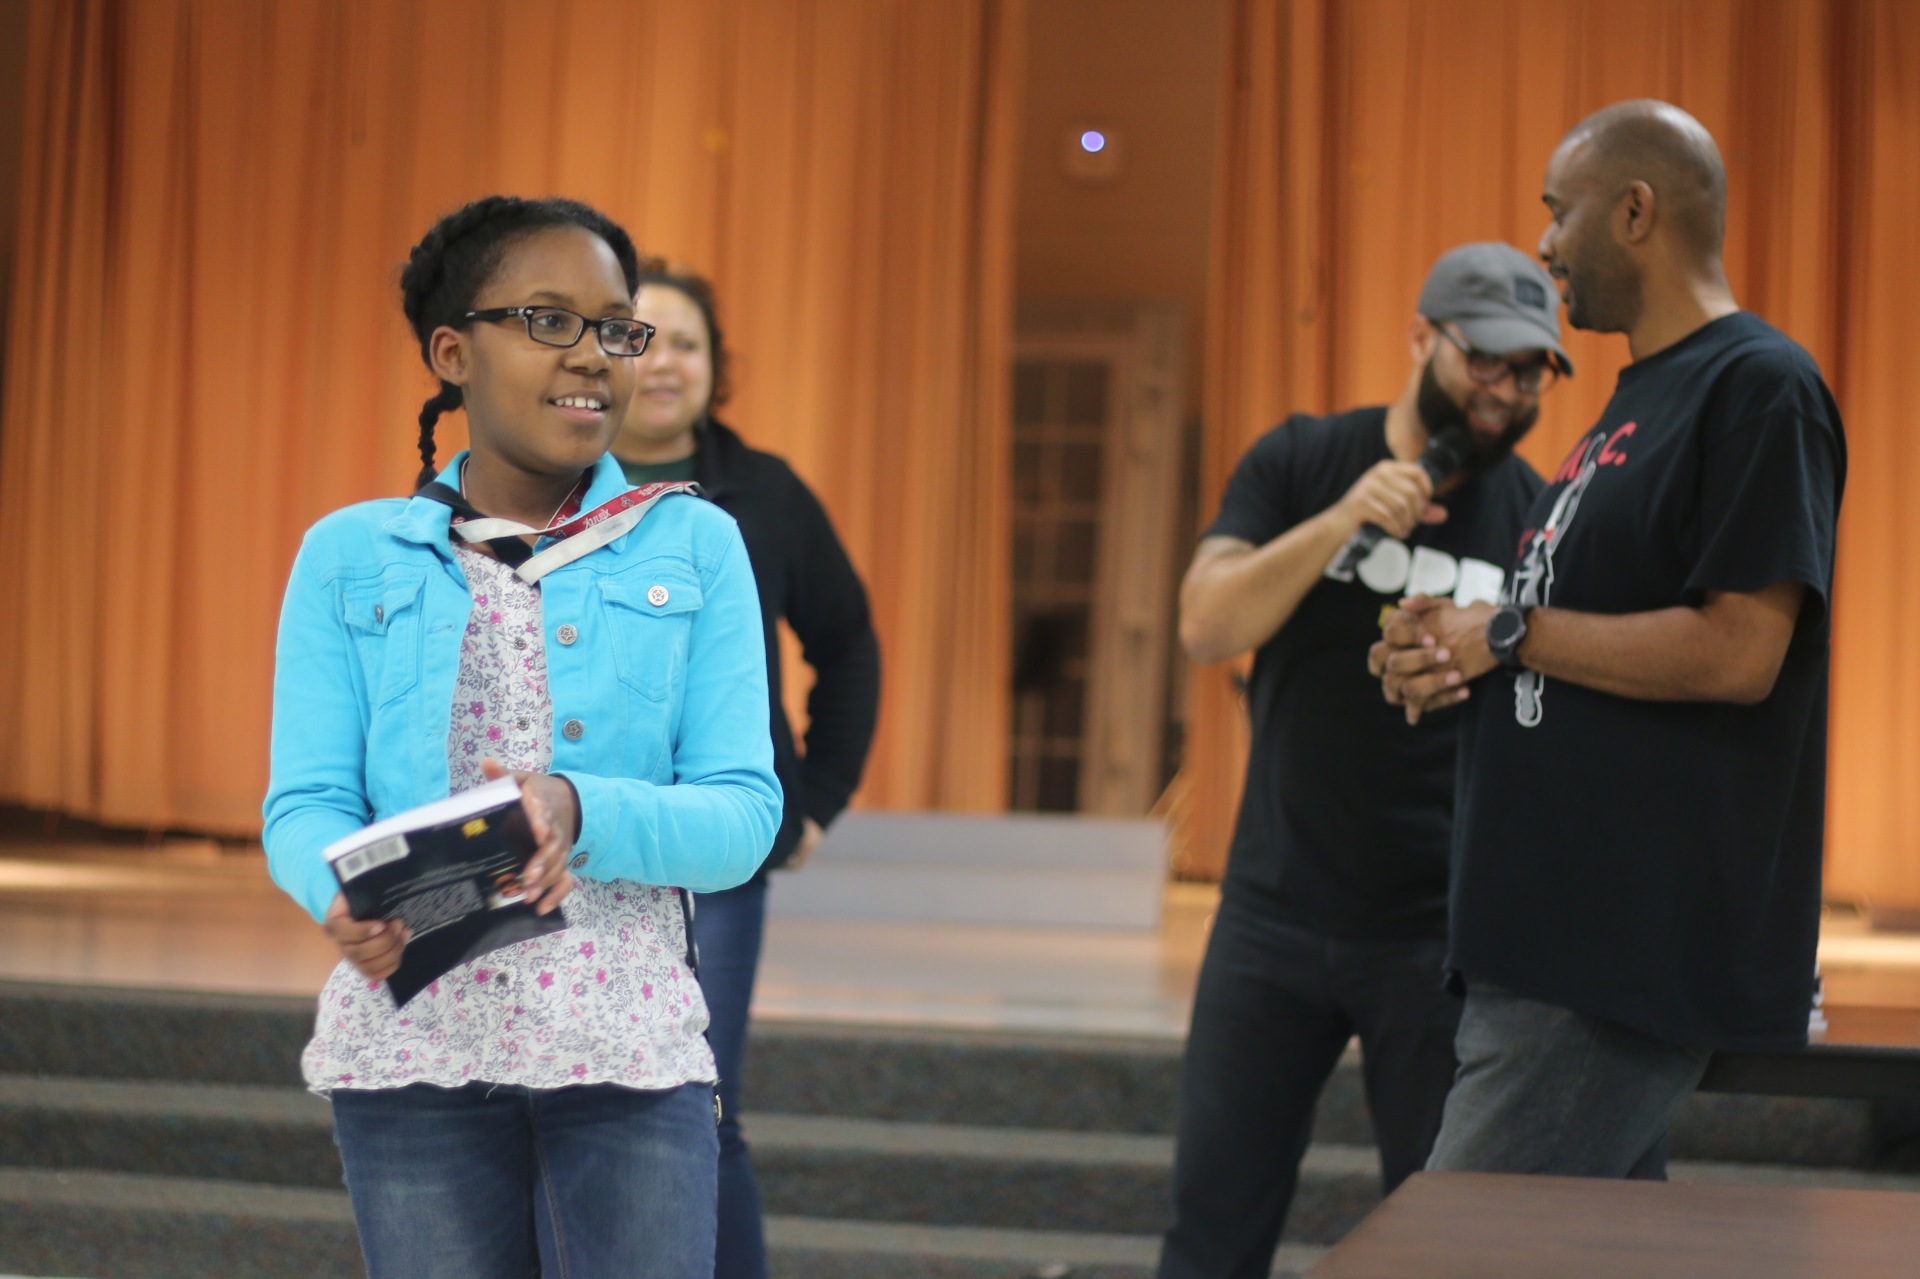 blake simon, youth speaker, youth motivation, youth empowerment, motivational speaker, education, blakemotivates, education expert, author, youth engagement, youth motivation, speaker